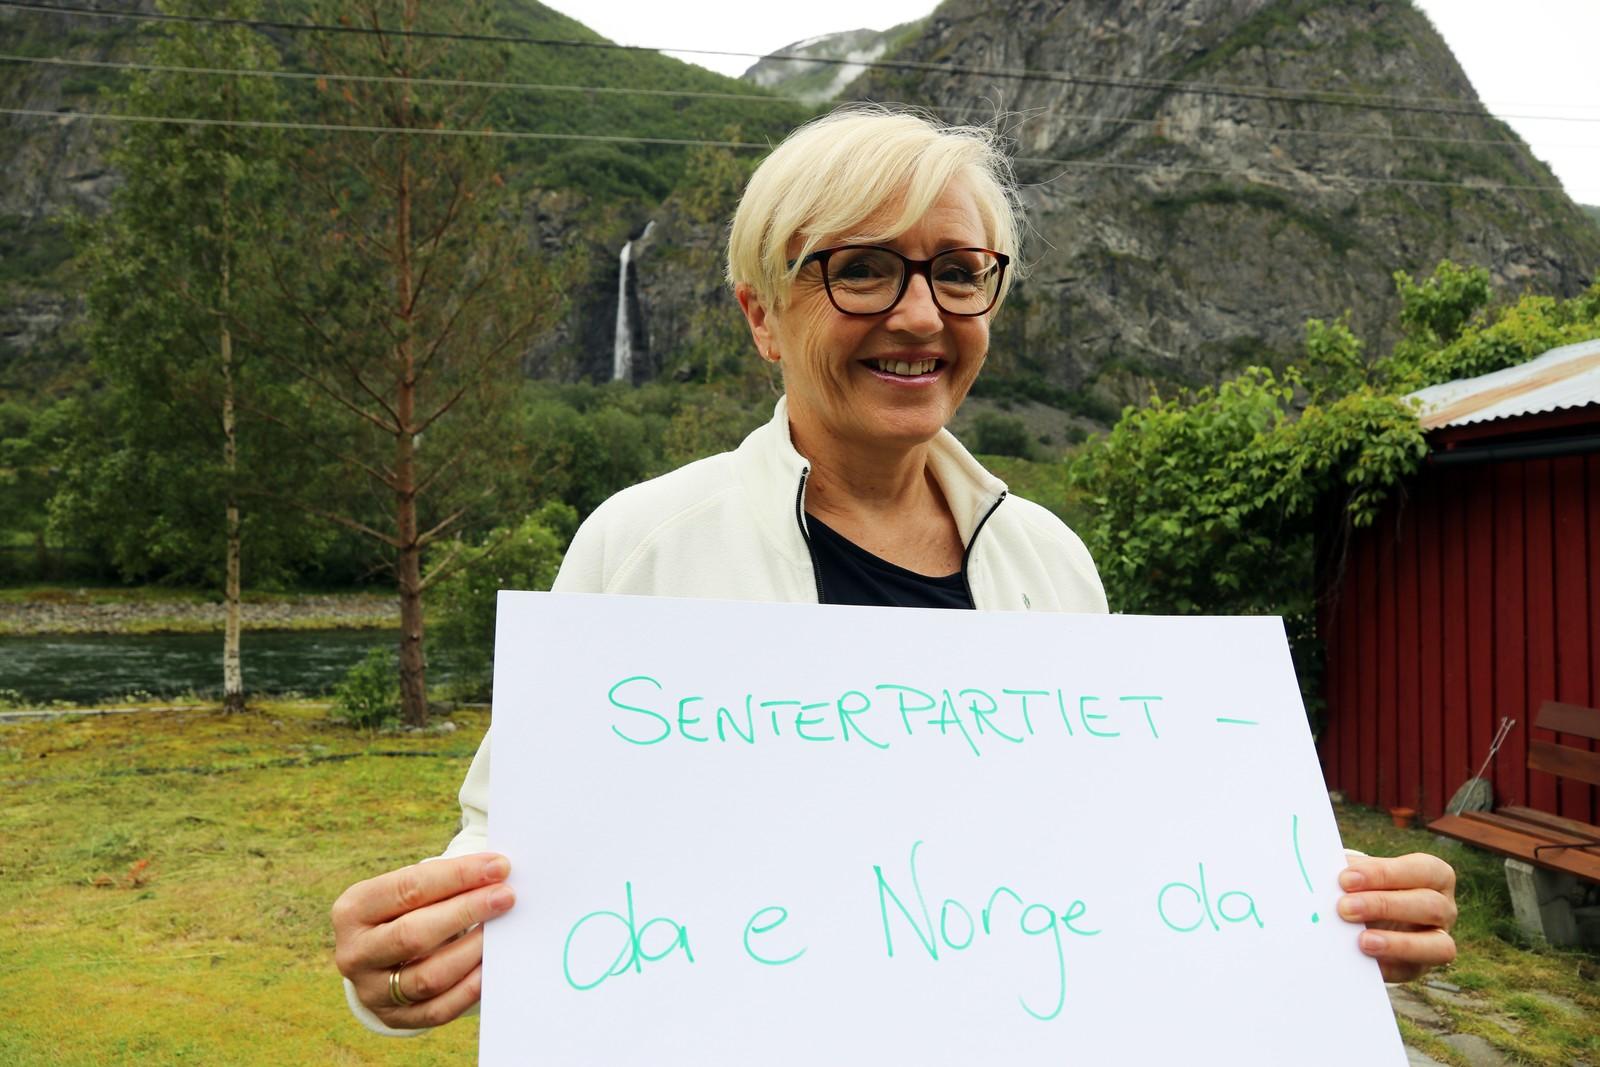 LIV SIGNE NAVARSETE (Sp): «Senterpartiet, da er Norge da».